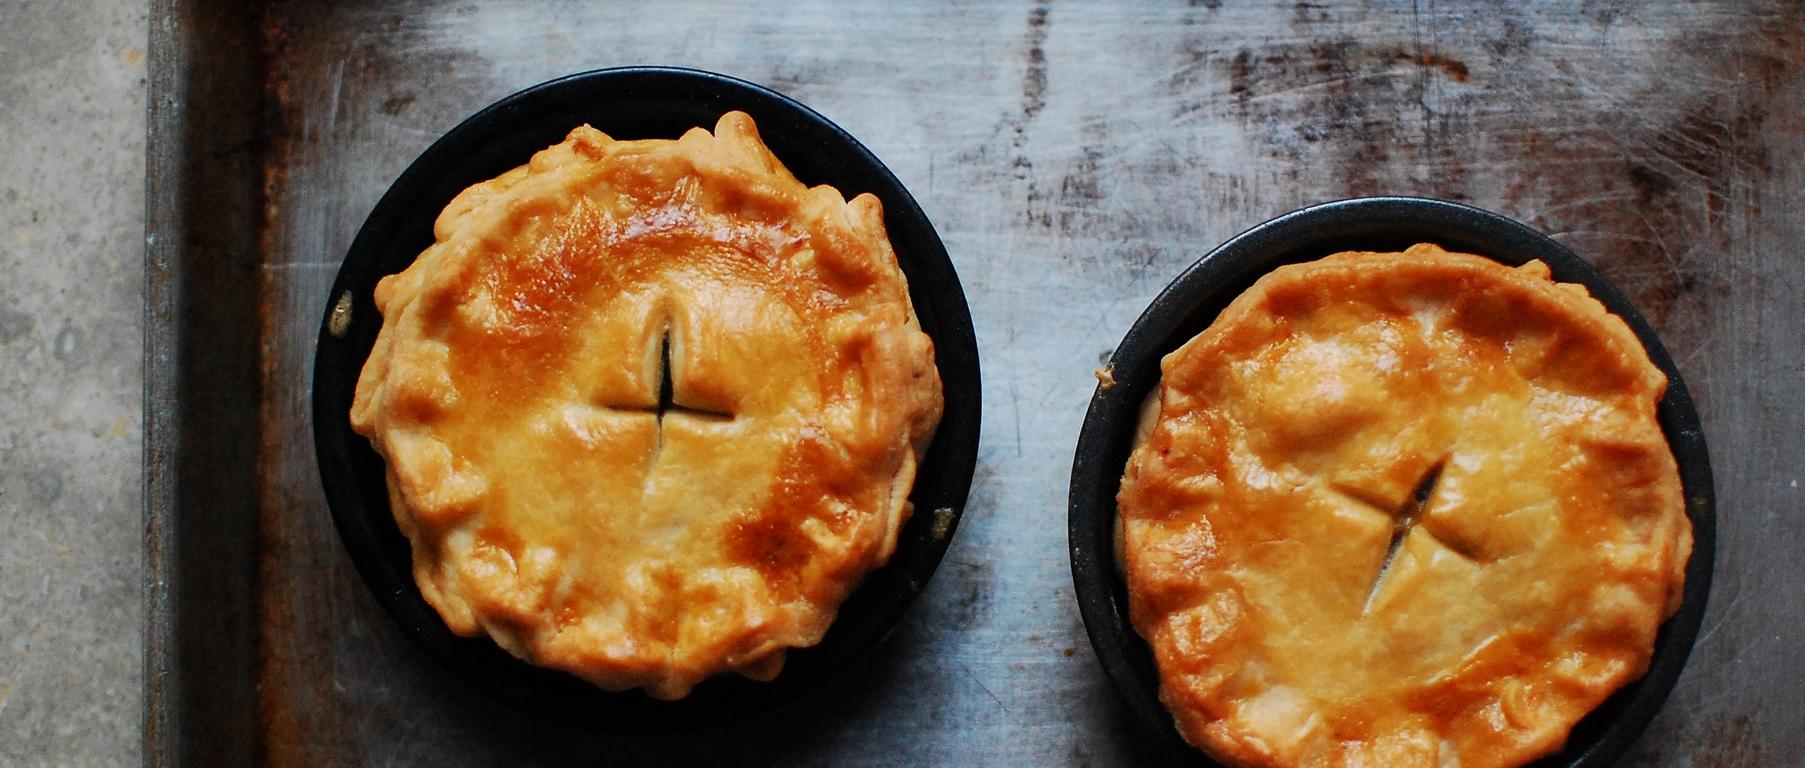 Australian Classics Meat Pies N Sausage Rolls Rustica Retro